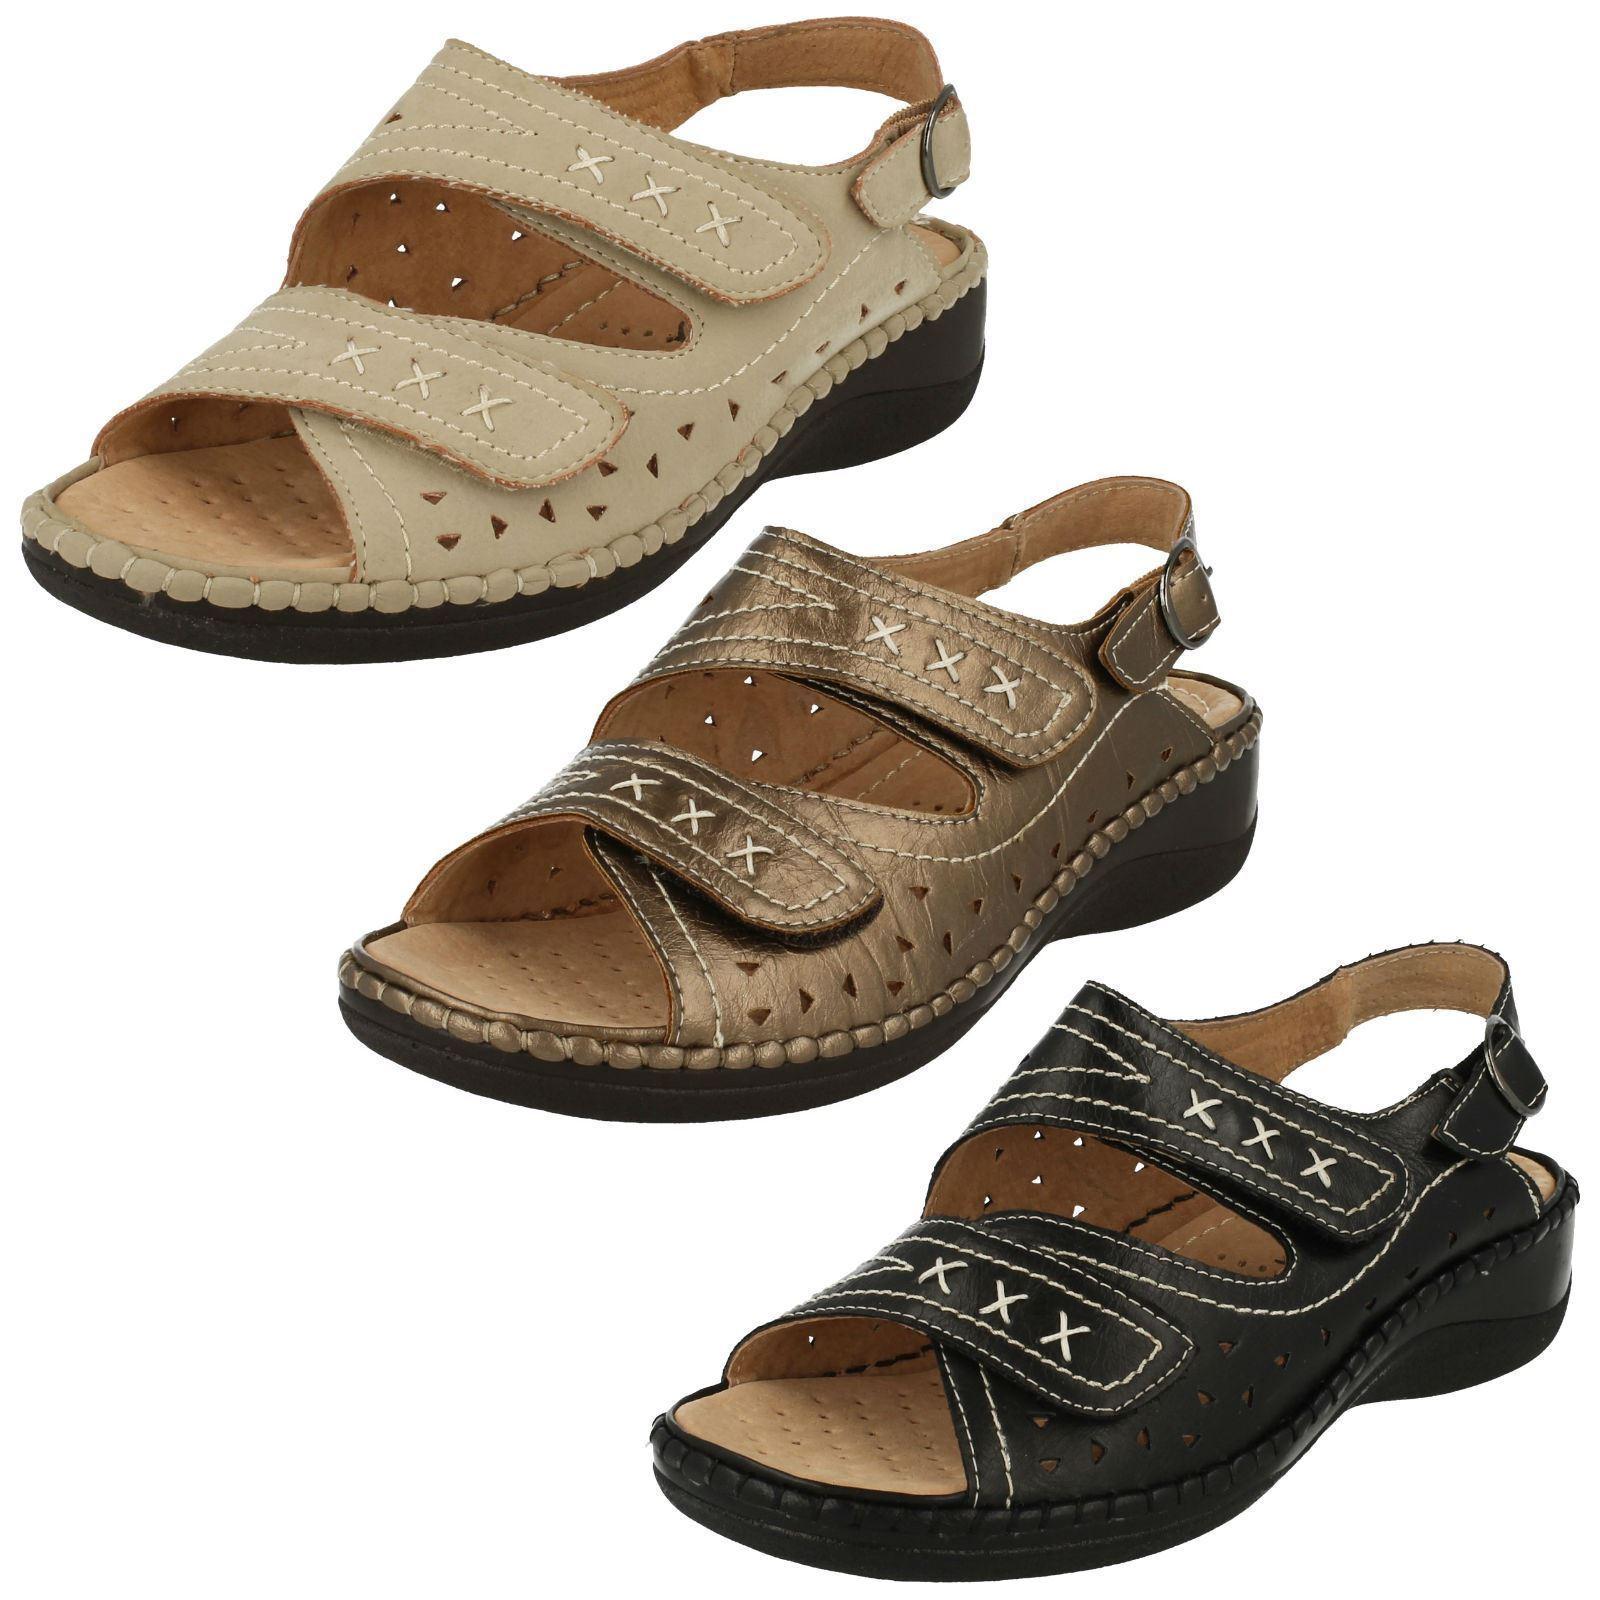 Ladies SANDPIPER wedge  wedge SANDPIPER sandals style sun 596841